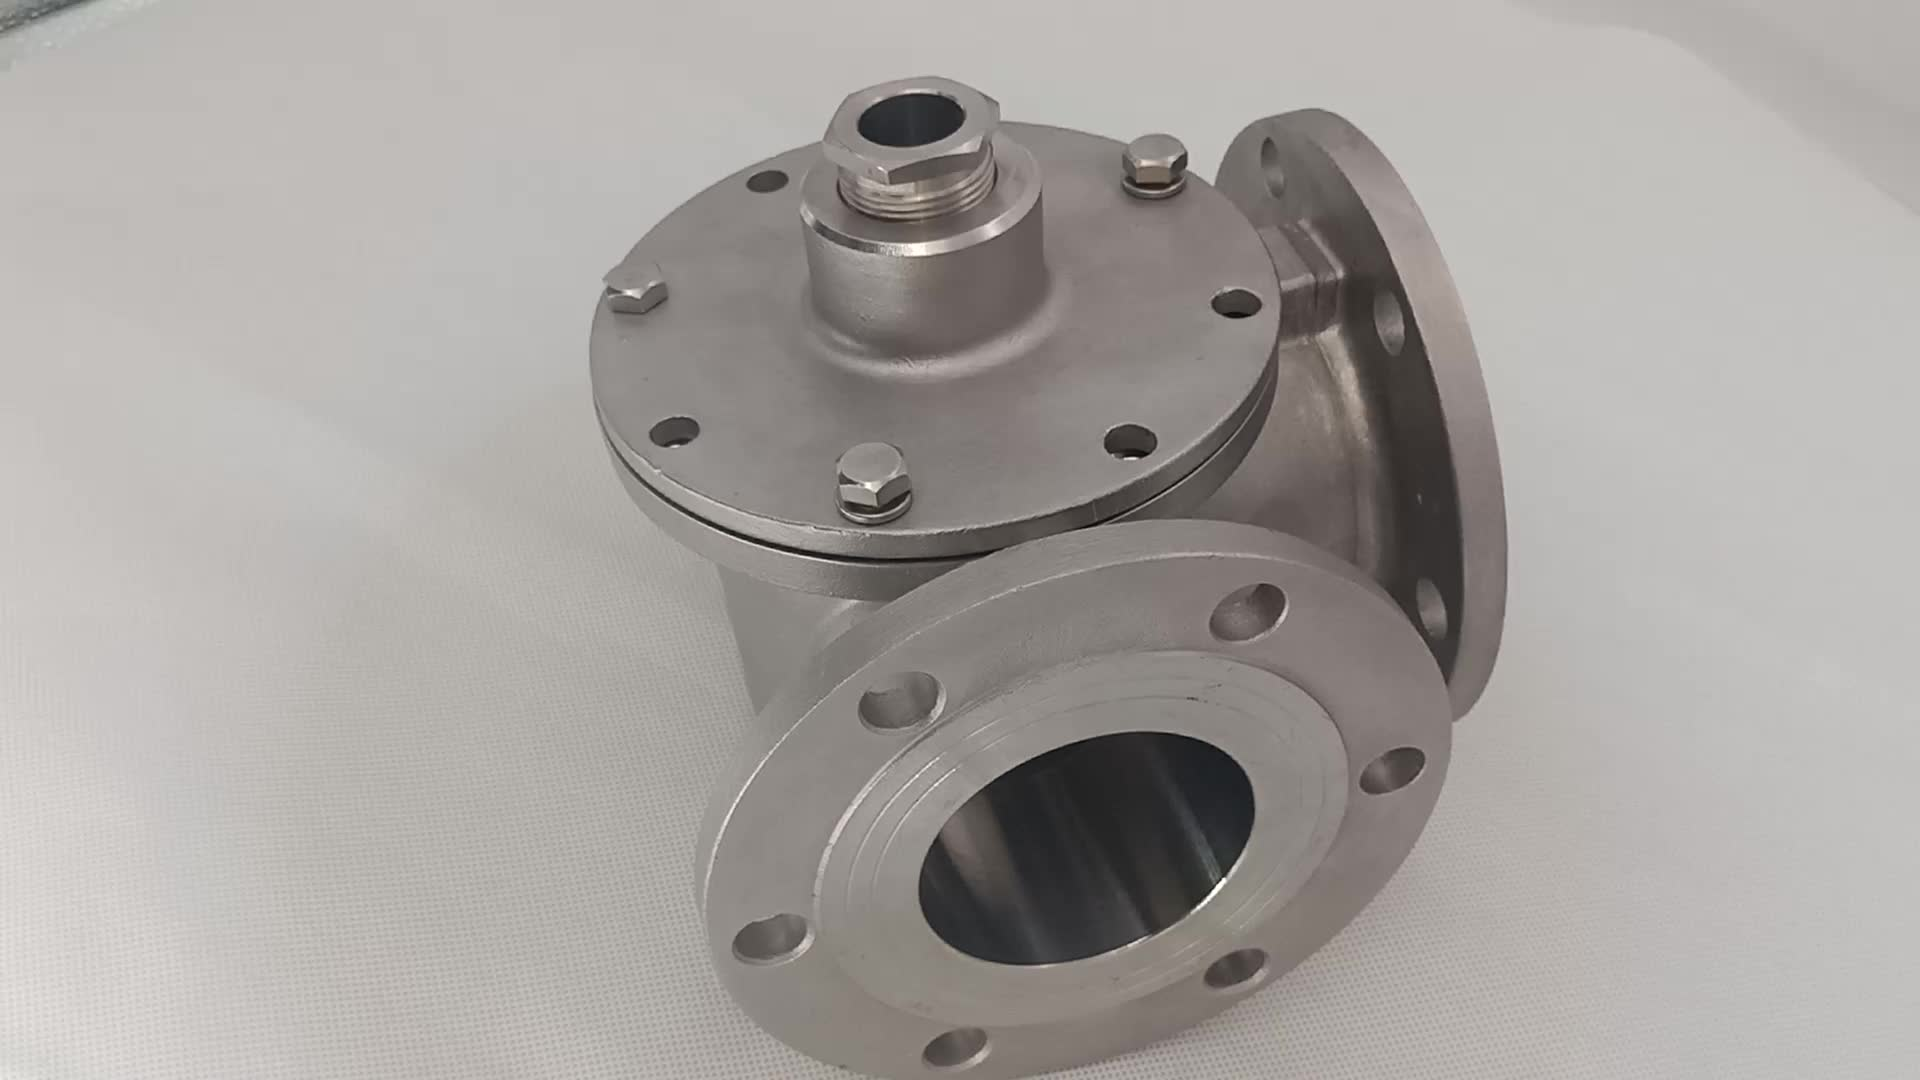 OEM ODM custom precision cnc machining auto parts, valve parts, agricultural machinery parts